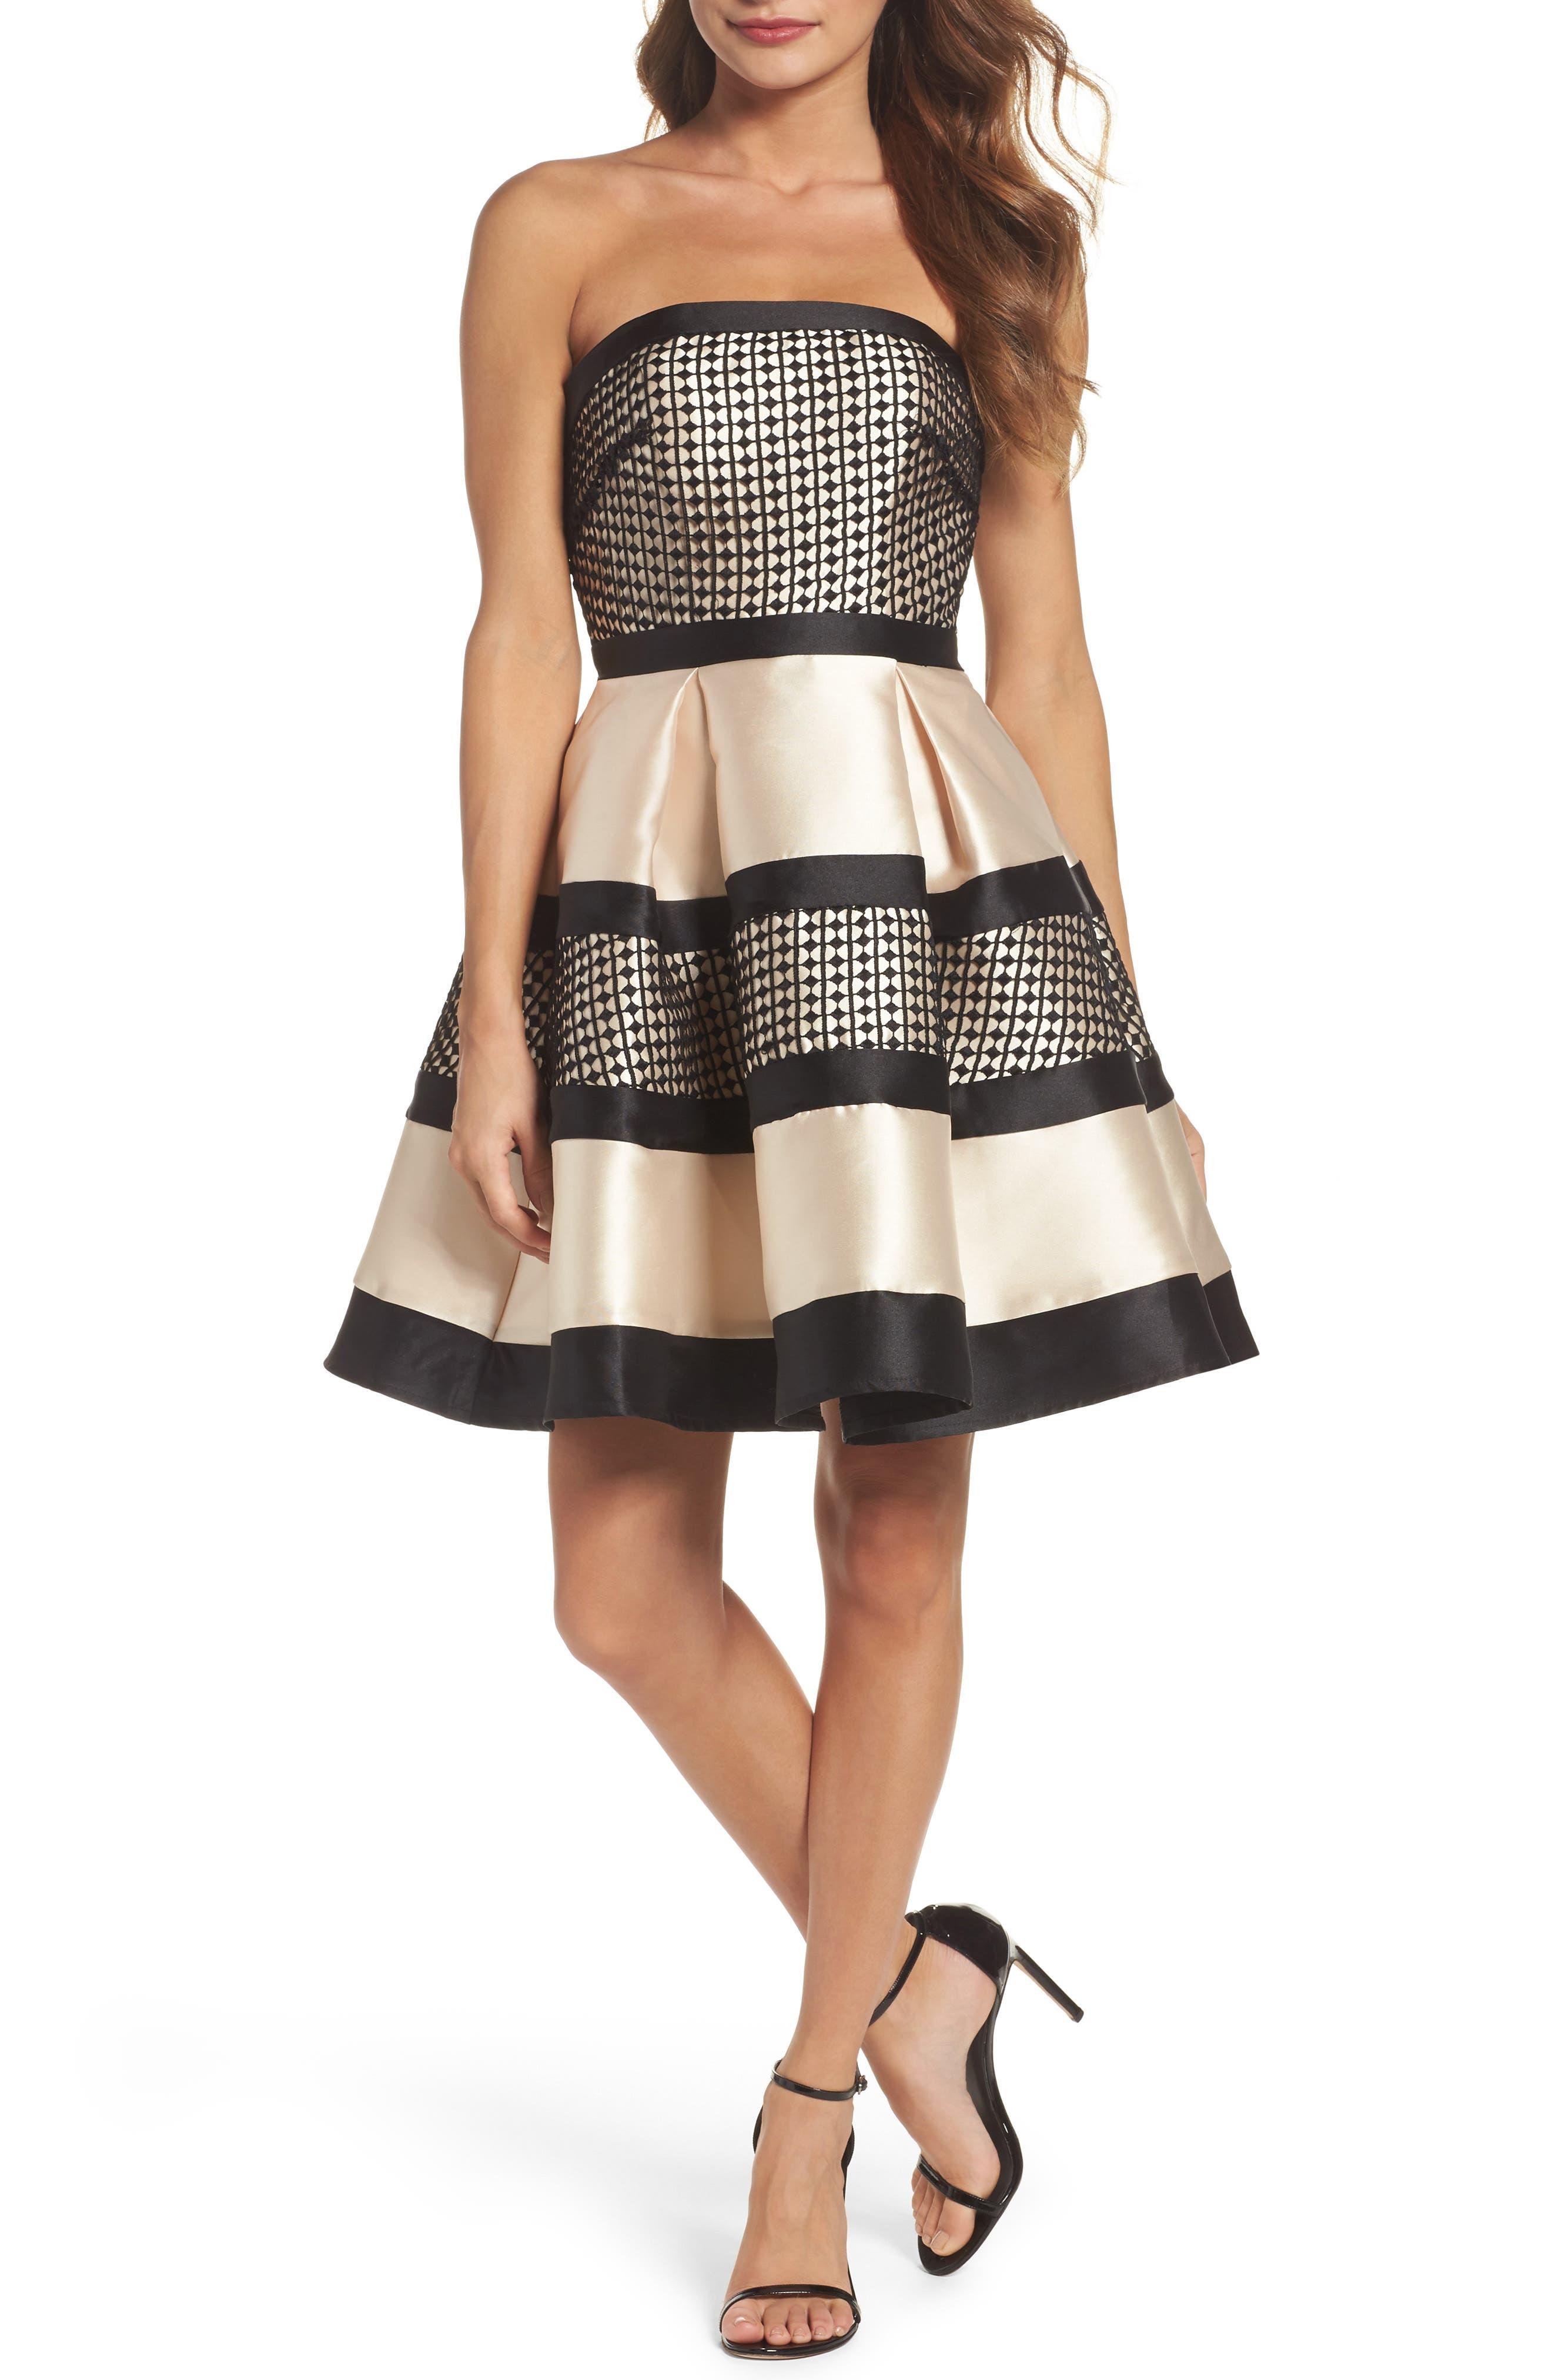 Crochet & Satin Fit & Flare Dress,                         Main,                         color, Cream/ Black